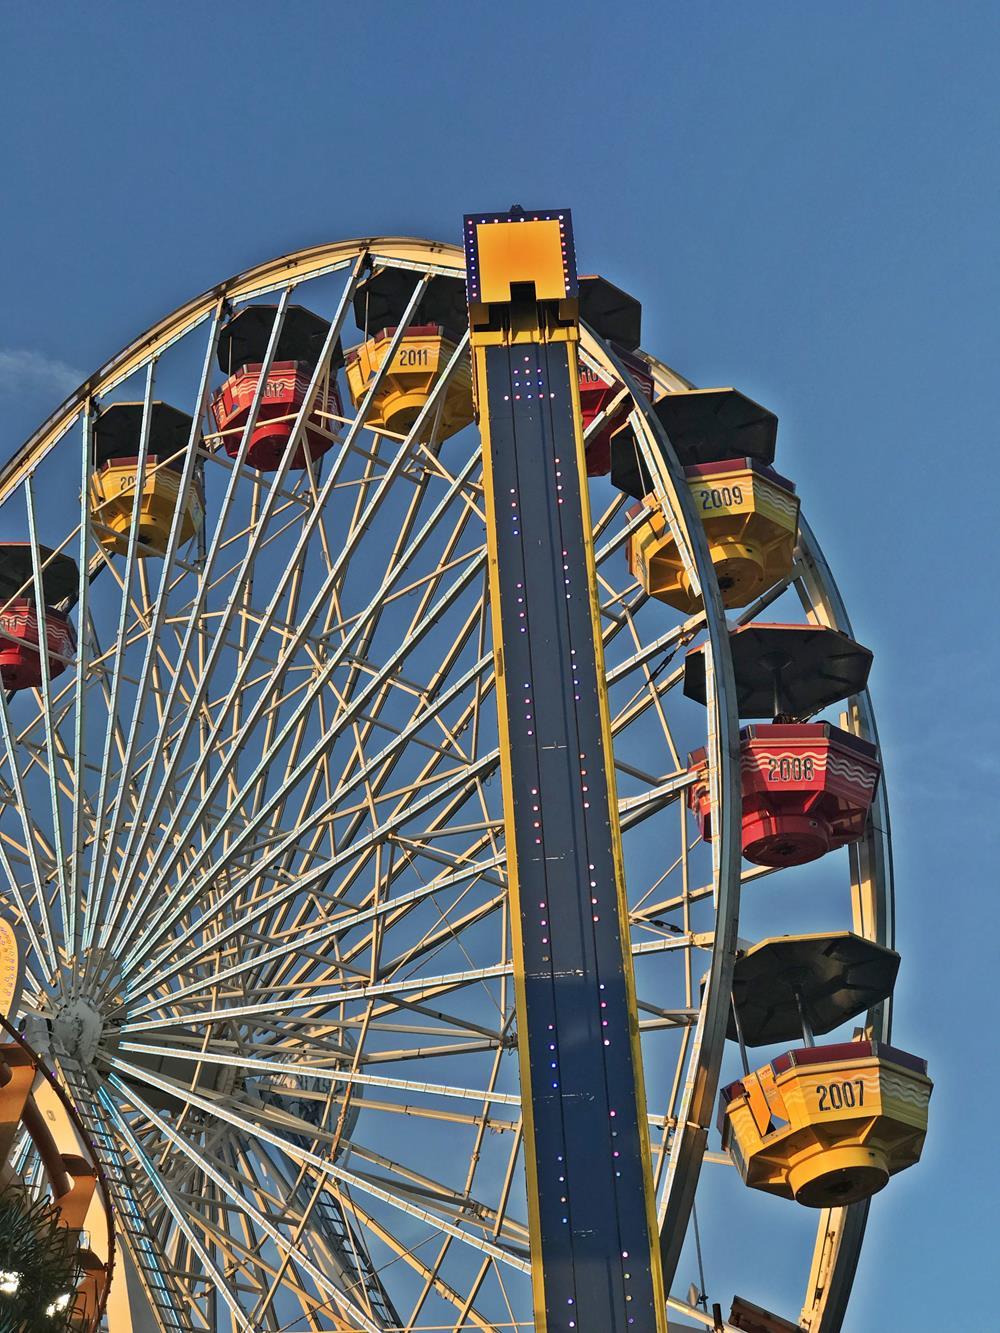 Ferris wheel cars on Santa Monica pier